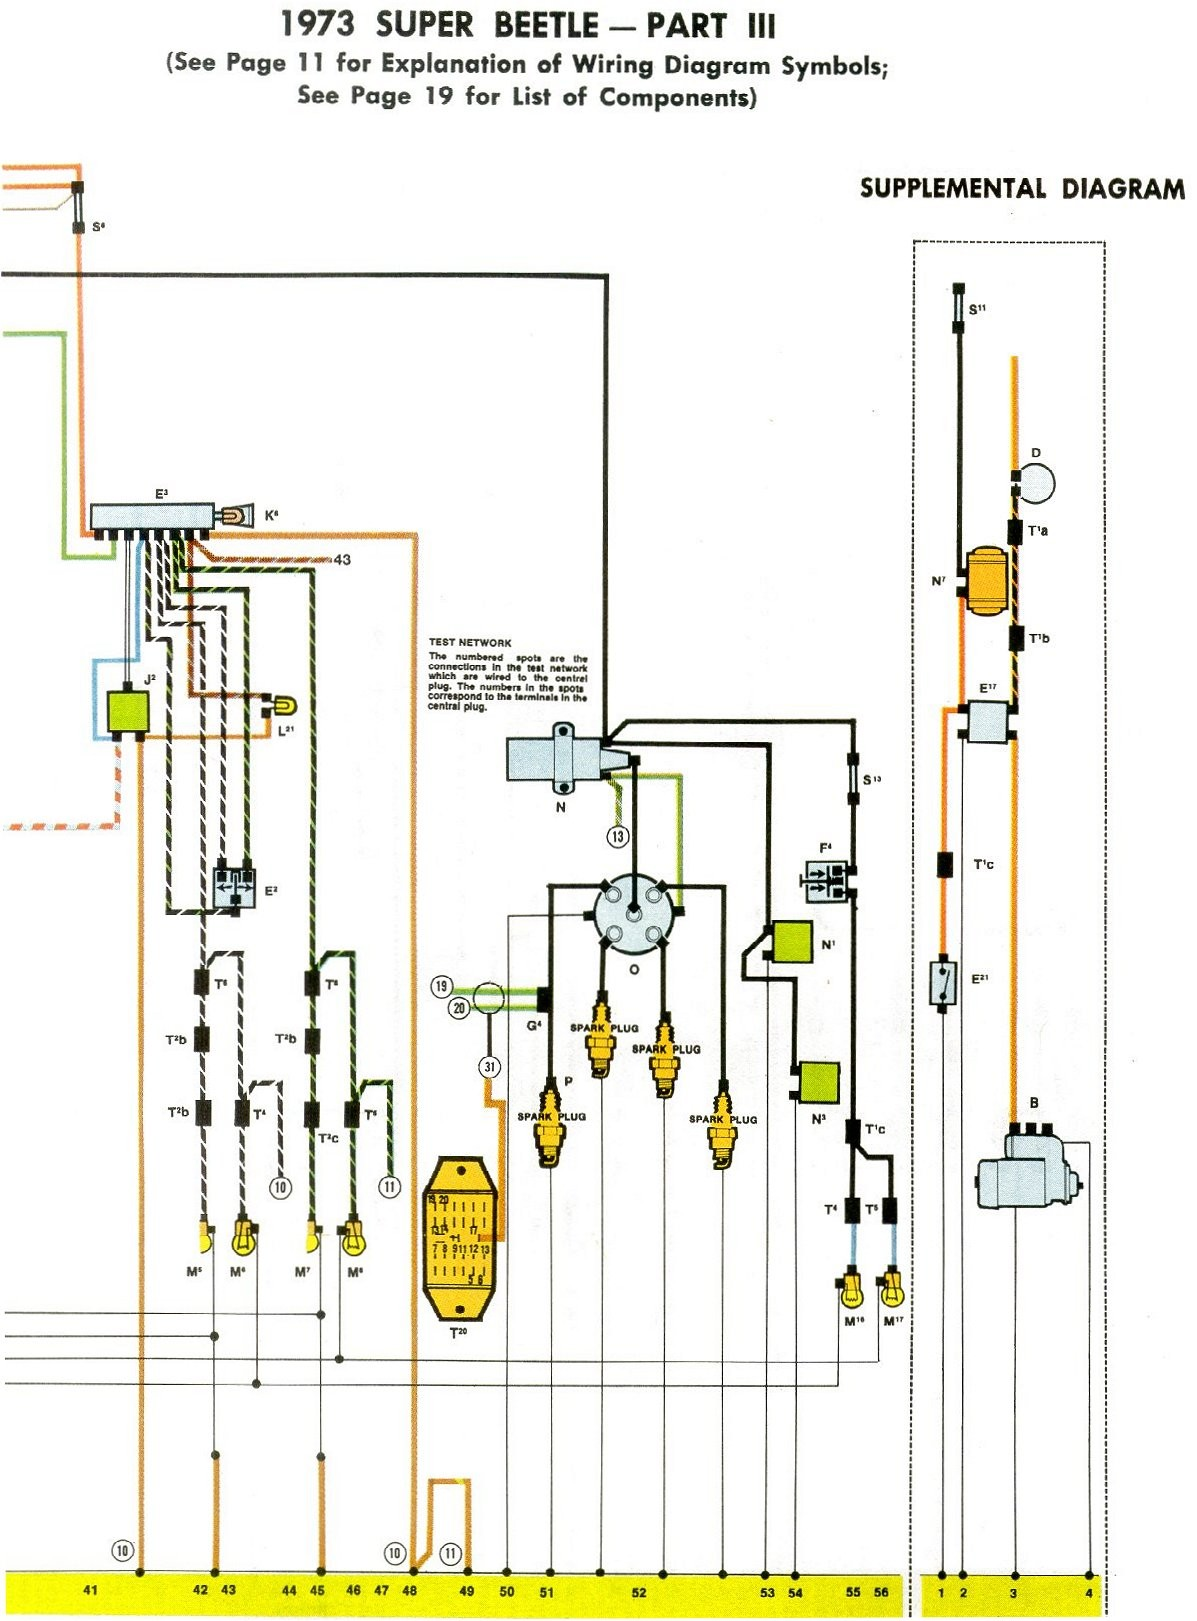 73 Beetle Starter Wiring Diagram Good Guide Of For 1968 Volkswagen Library Rh 95 Nepalchitragupta Org 1973 Vw